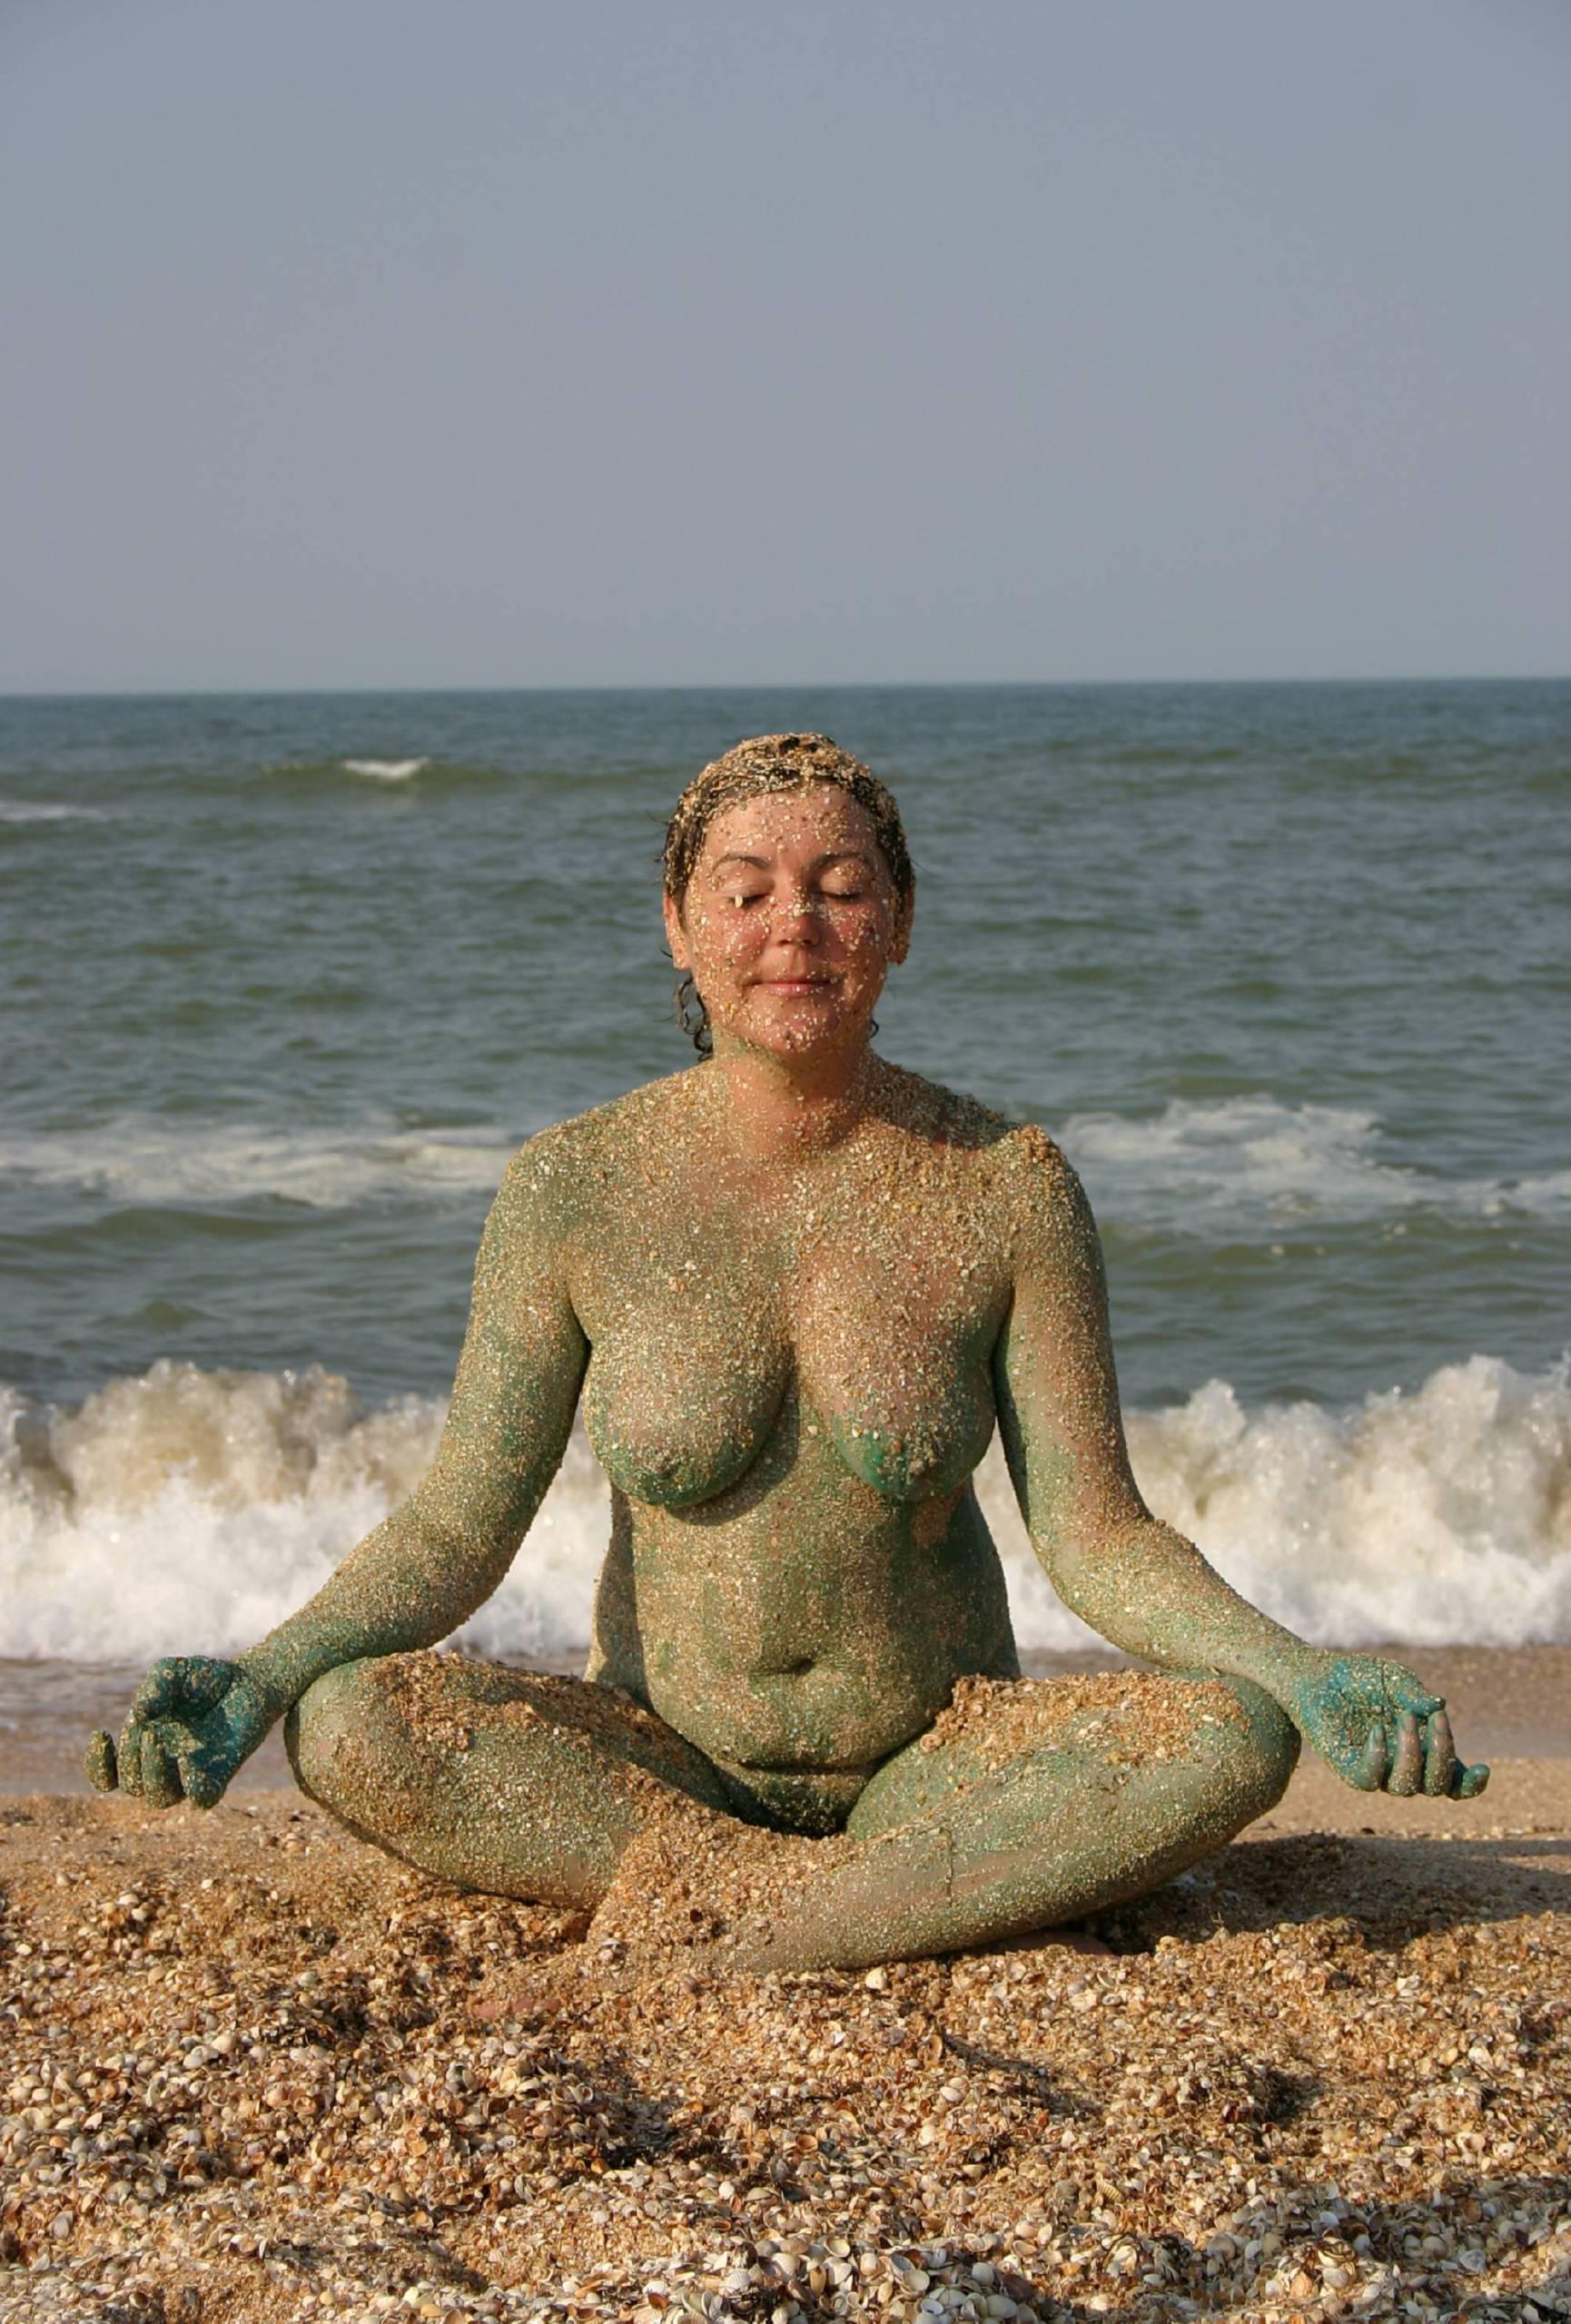 Nudist Pictures Golden Coast Beaches - 1